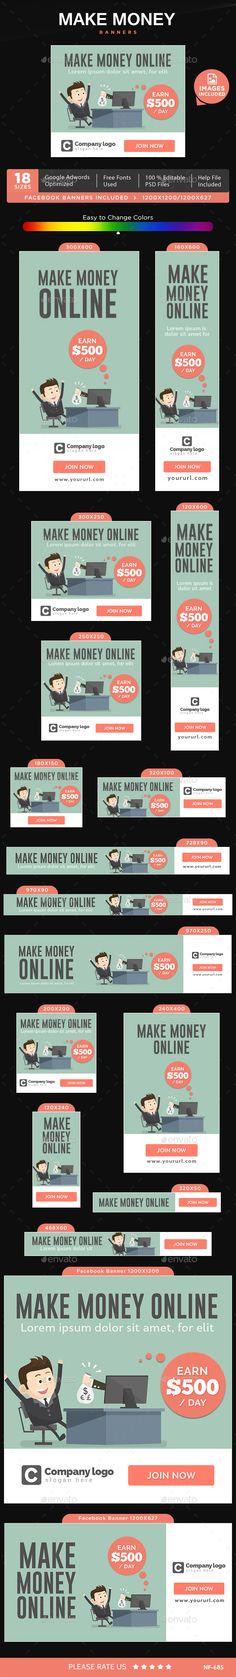 Make Money Web Banners Template #design #ad Download: http://graphicriver.net/item/make-money-banners/13110266?ref=ksioks